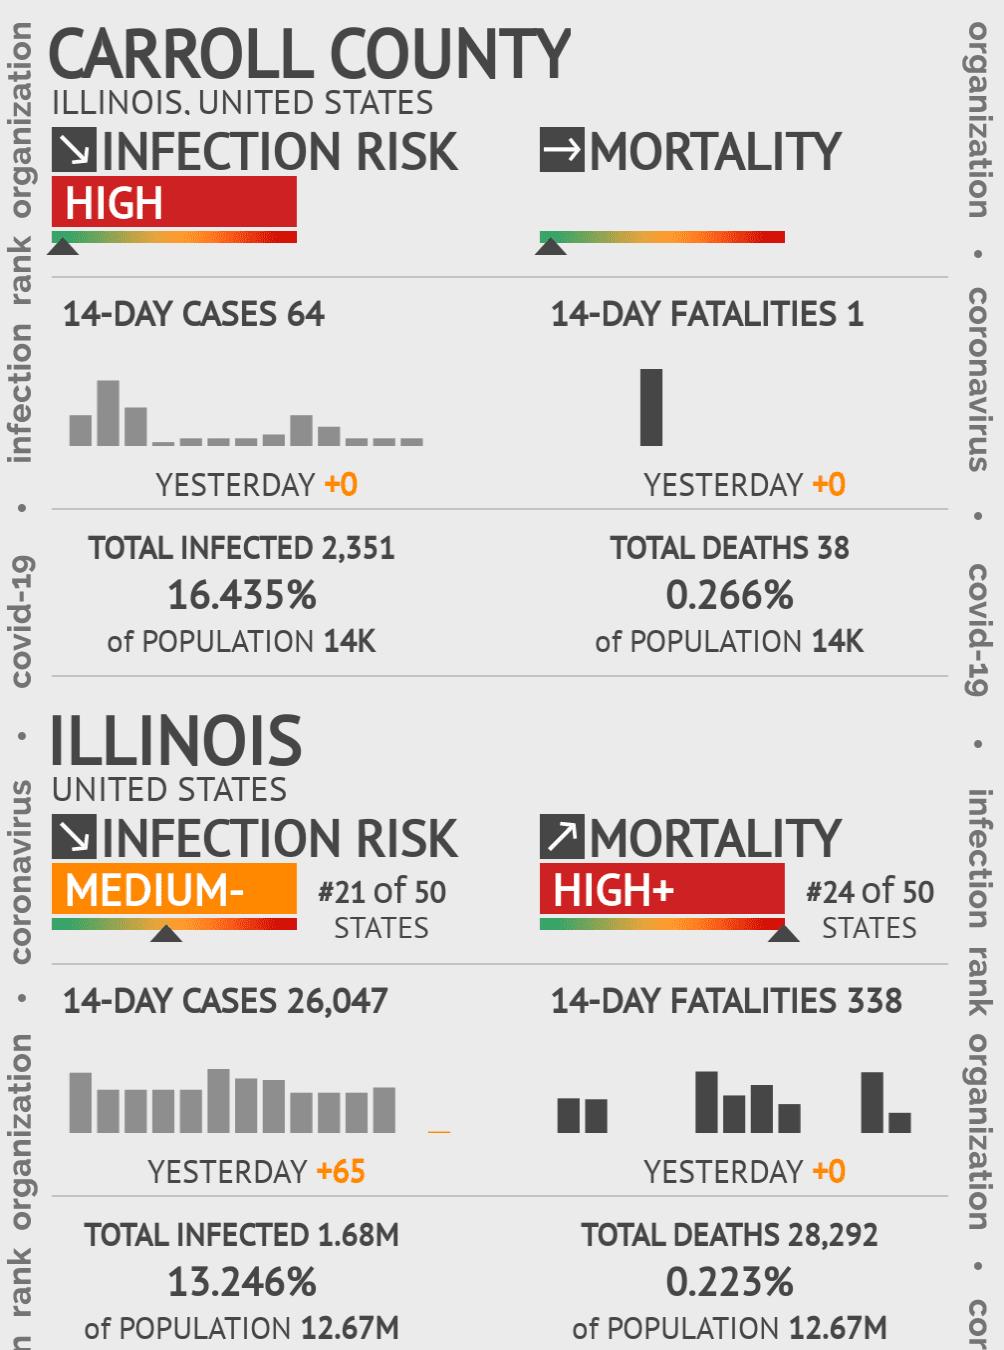 Carroll County Coronavirus Covid-19 Risk of Infection on November 25, 2020